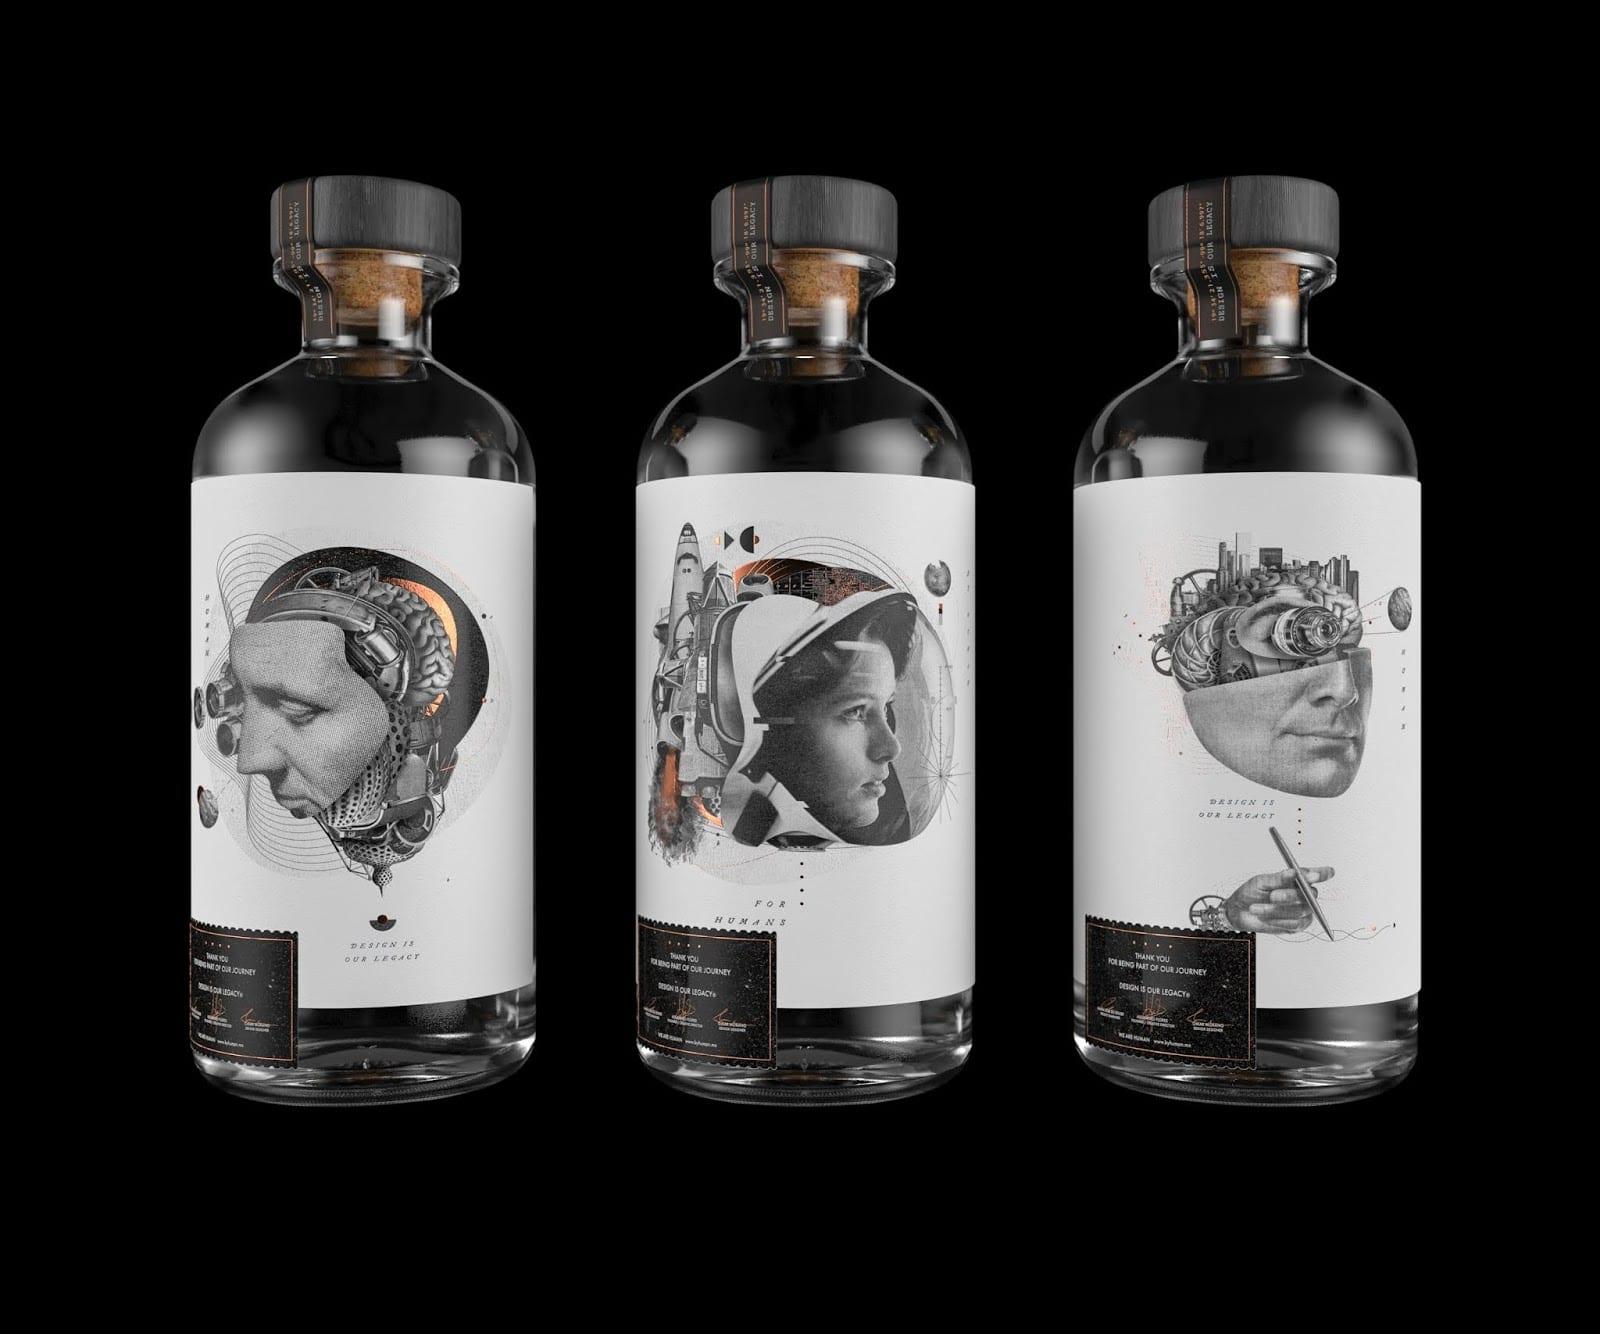 Human Legacy Bottles 3 - Ach, tie obaly – Lahve Human Legacy